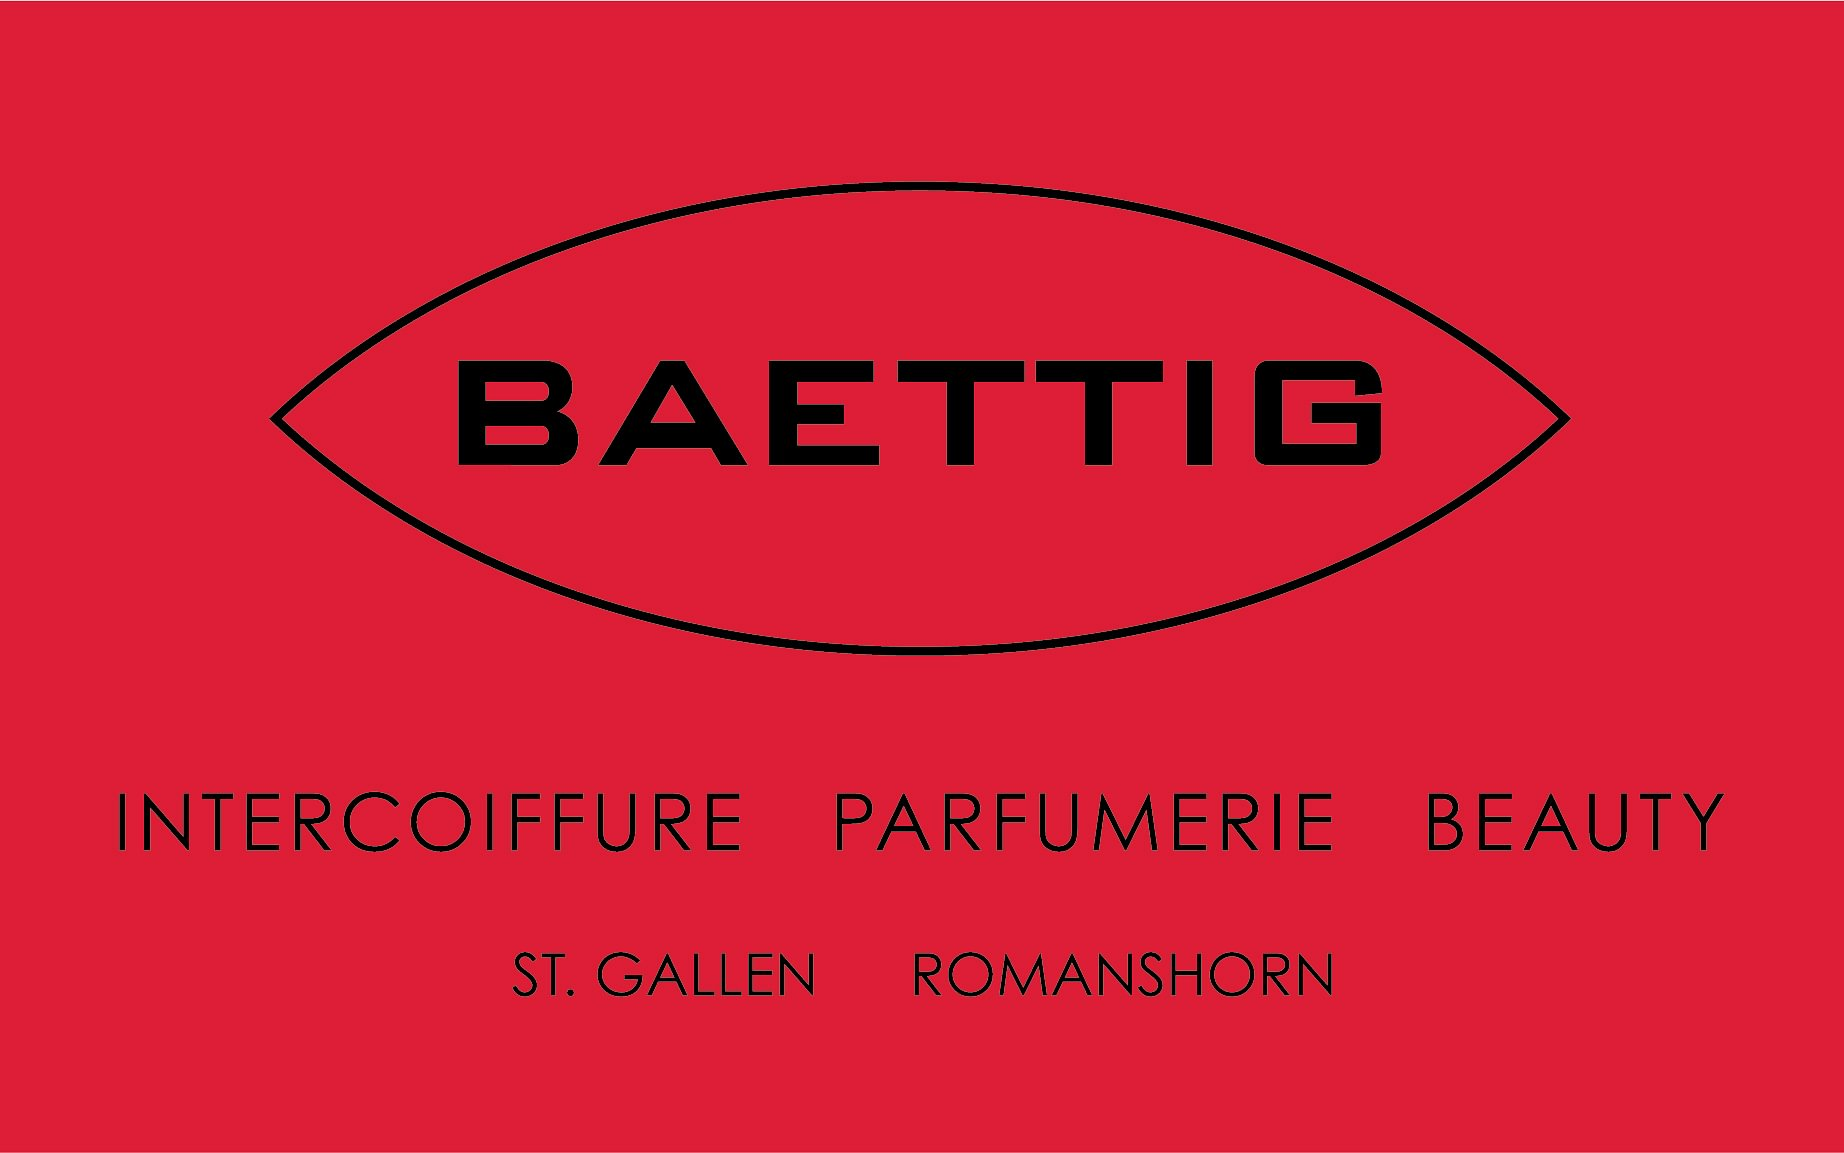 BAETTIG Intercoiffure Parfumerie Beauty